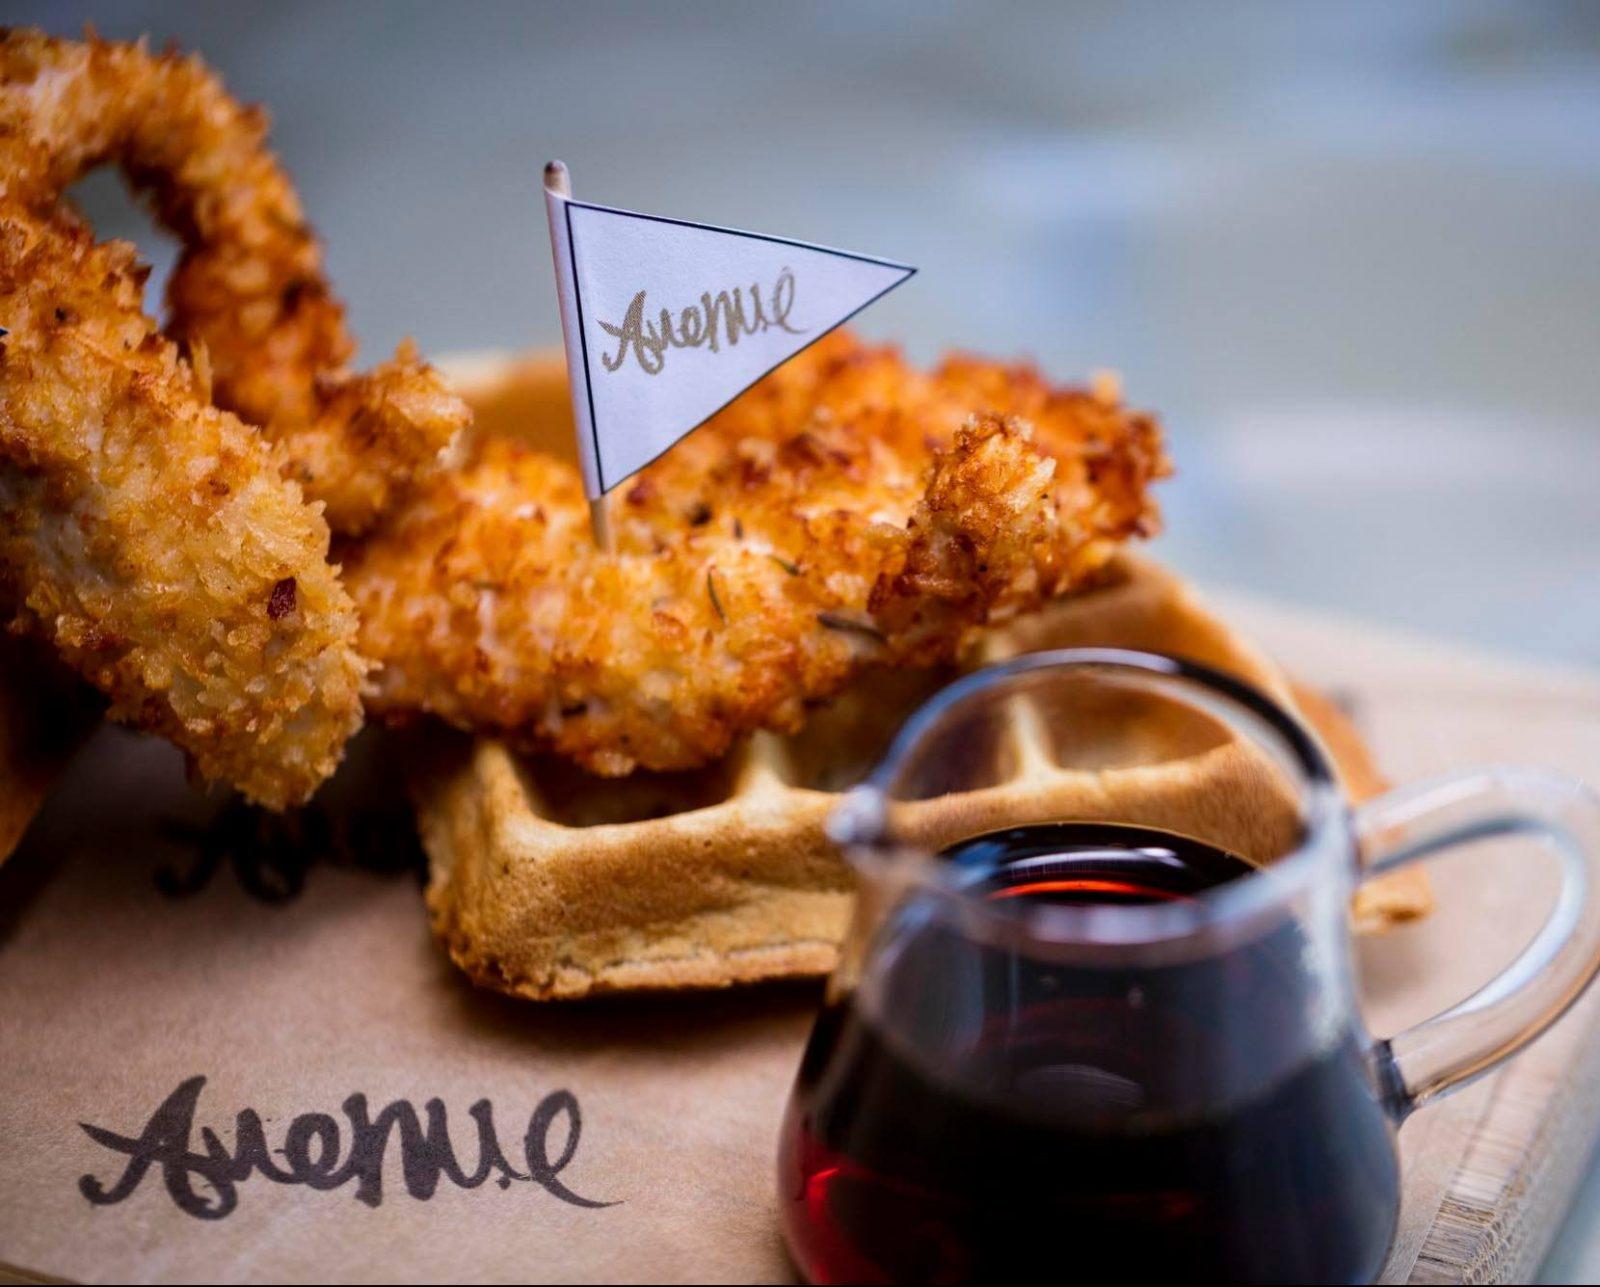 avenue restaurant london buttermilk chicken and waffle